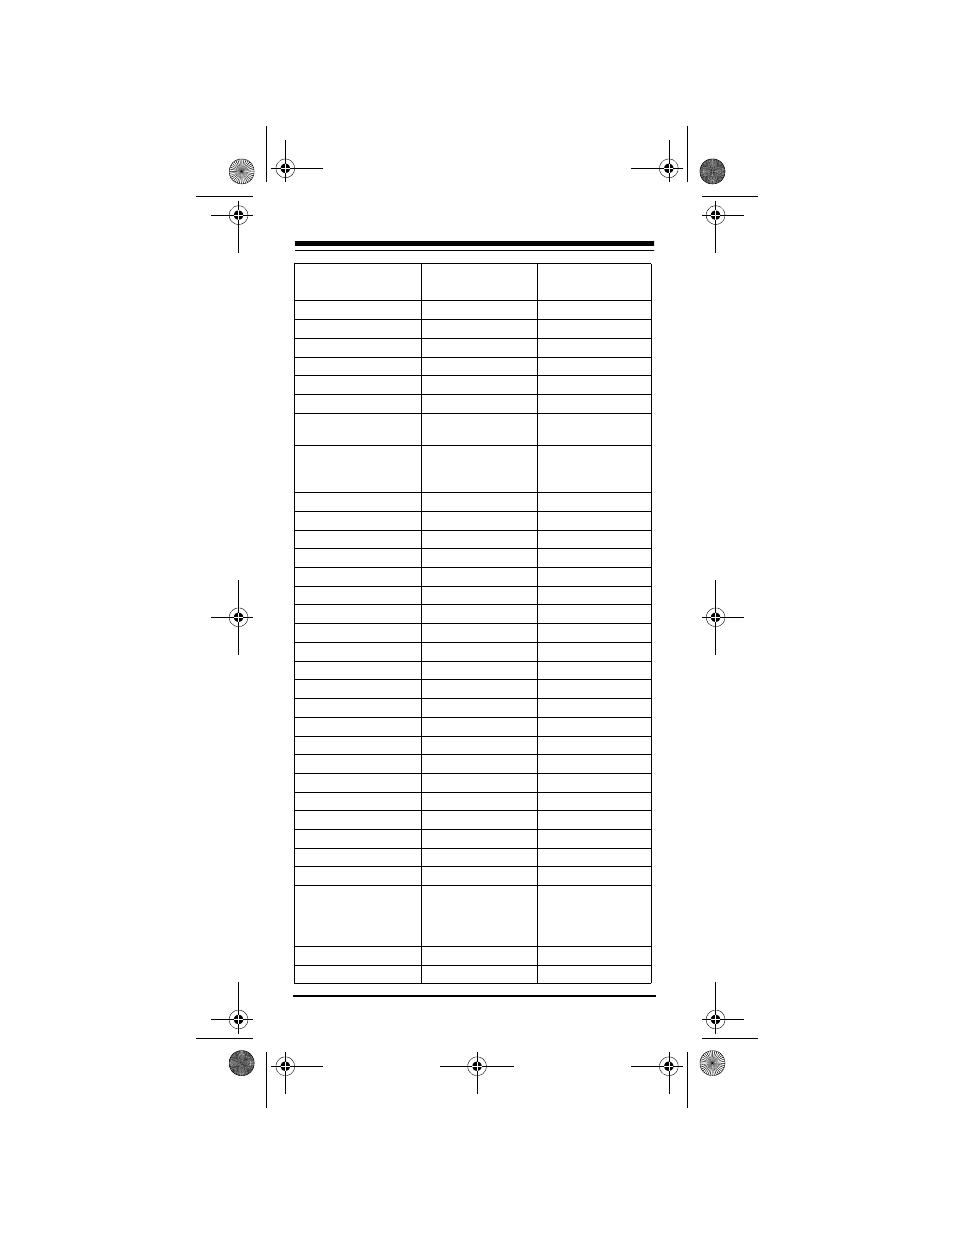 Radio Shack 3-IN-ONE POCKET REMOTE CONTROL 15-1990 User